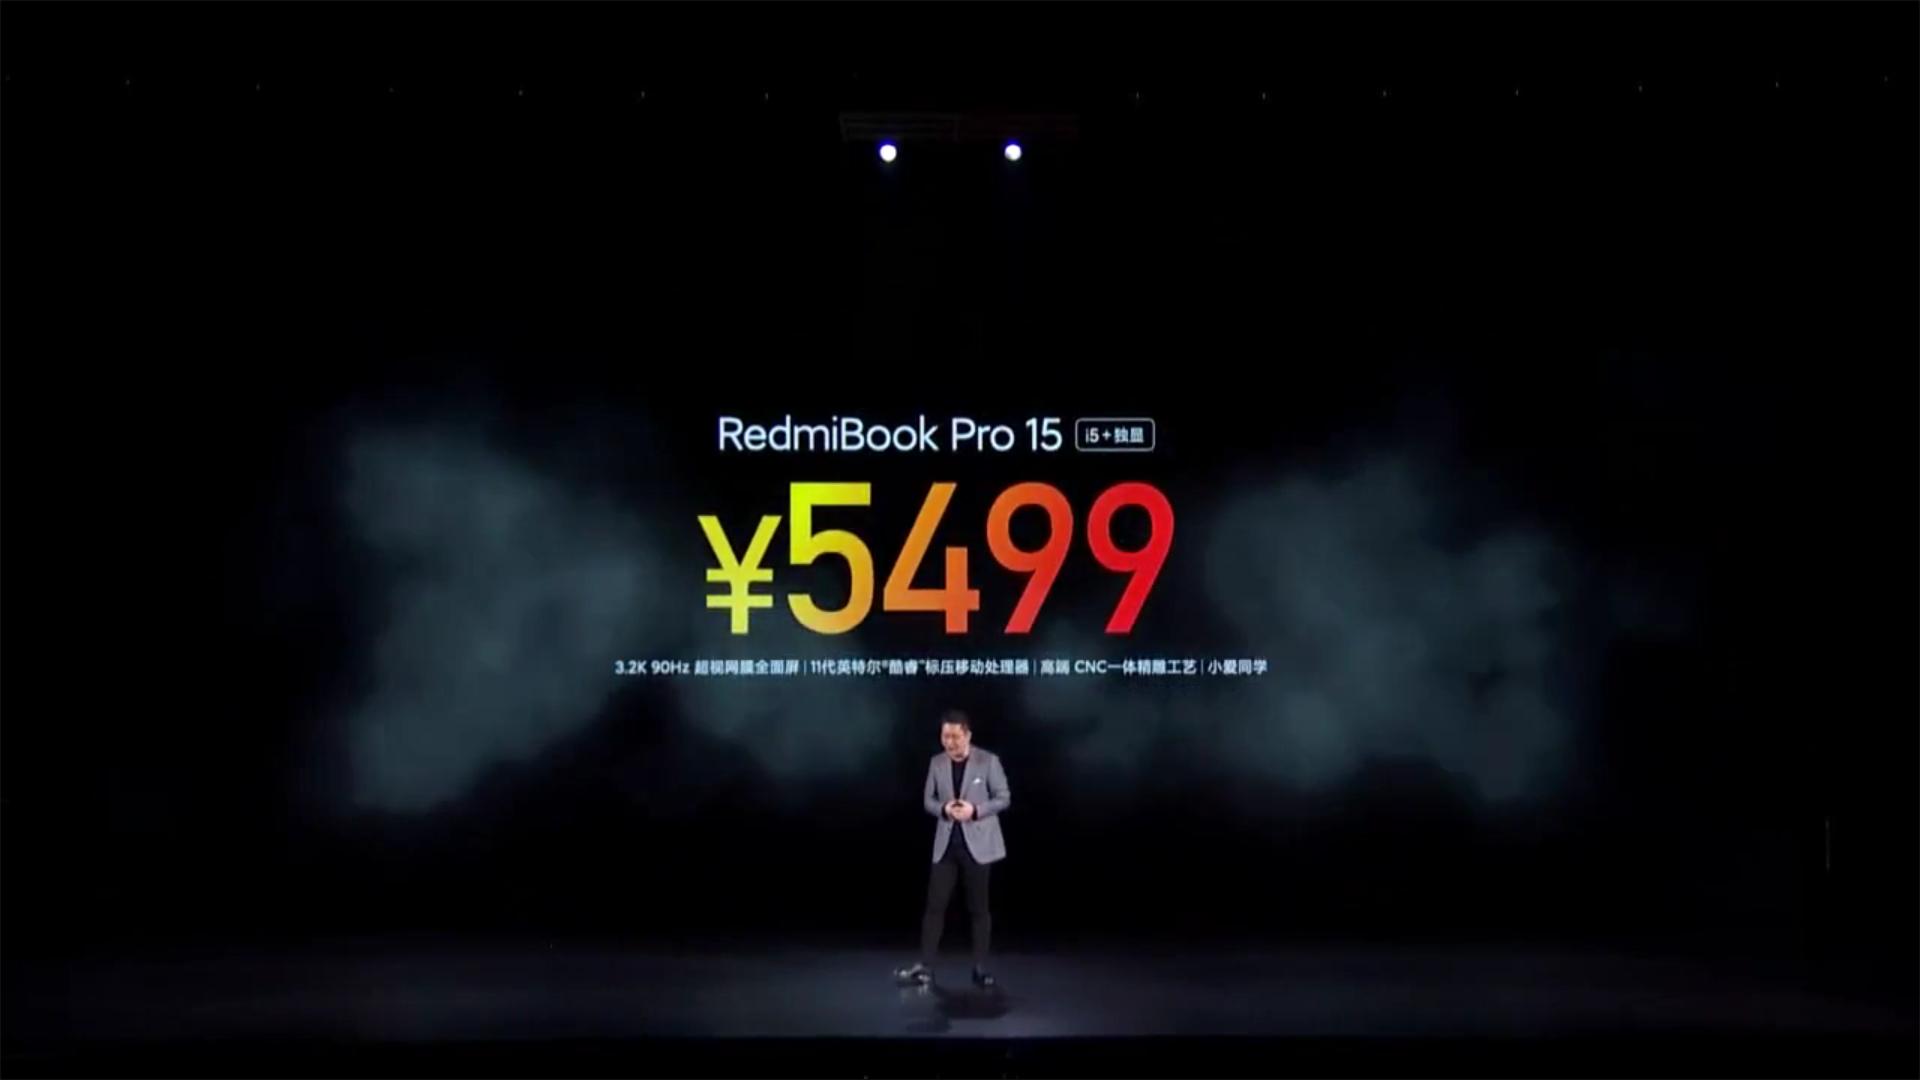 RedmiBook Pro 15